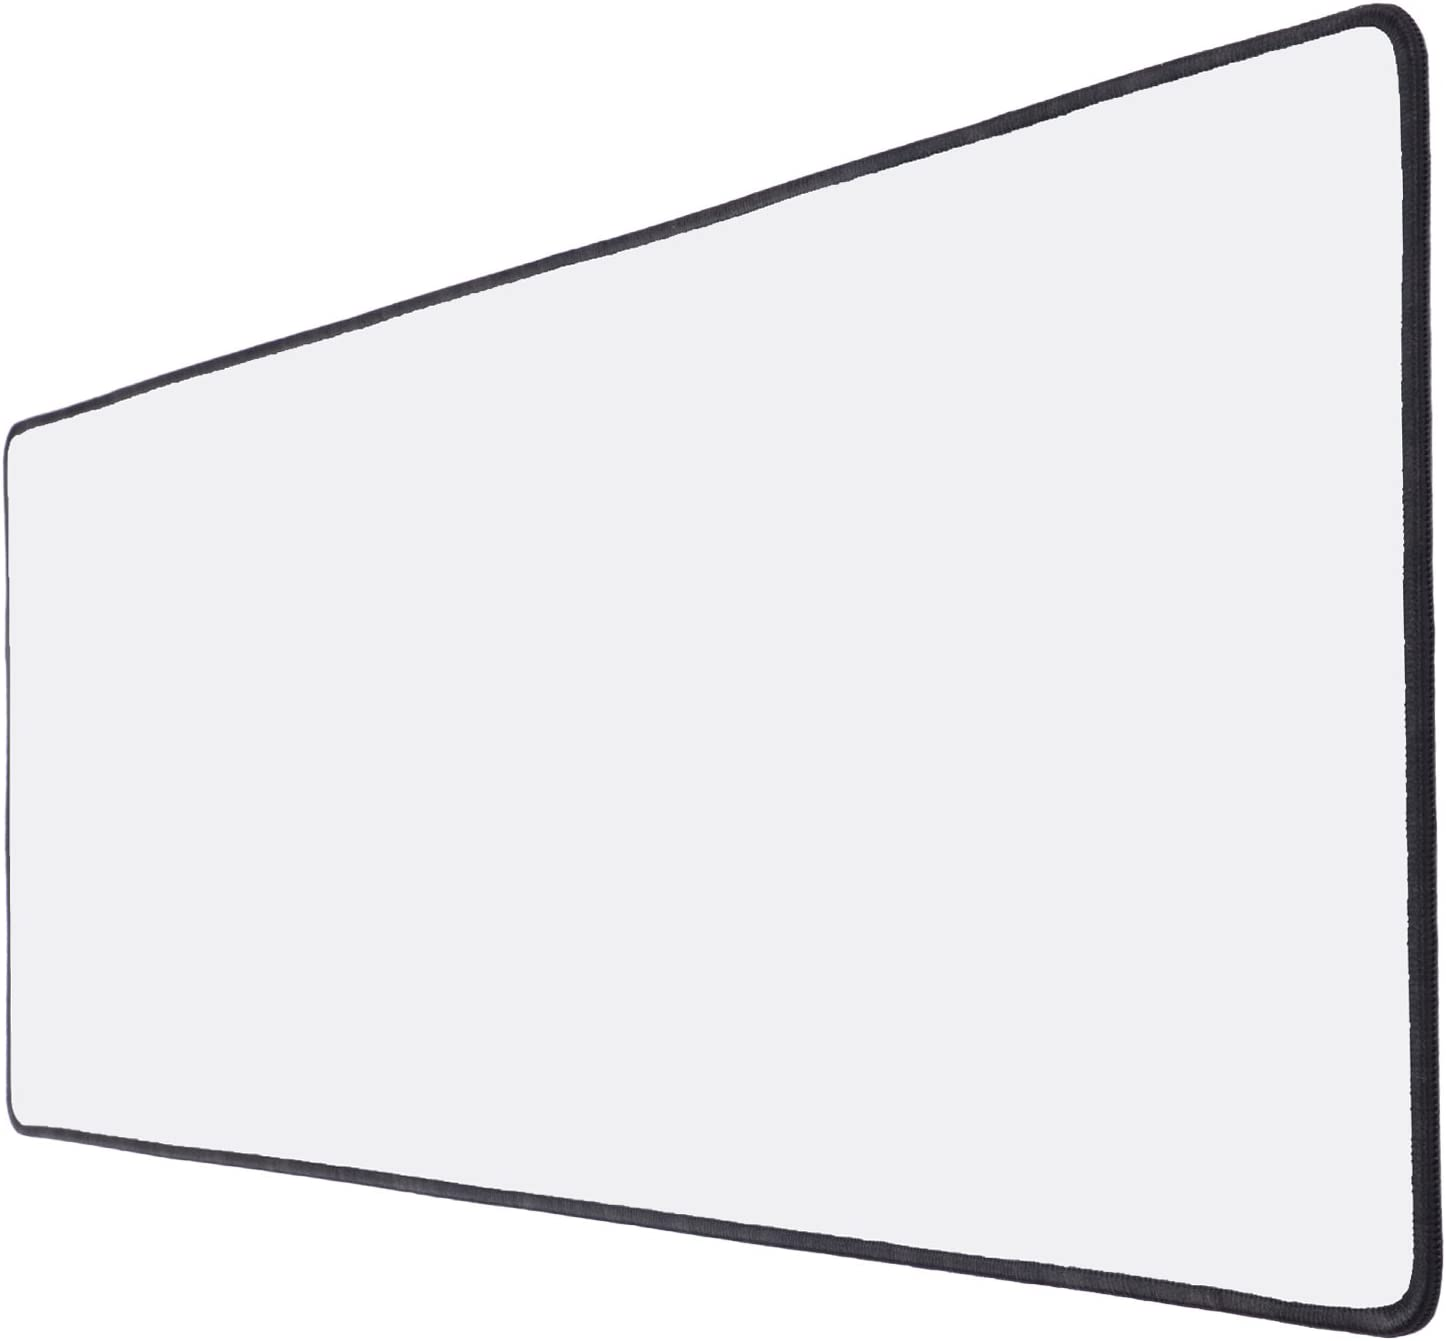 mousepad 80x30cm Base de goma antideslizante blanco